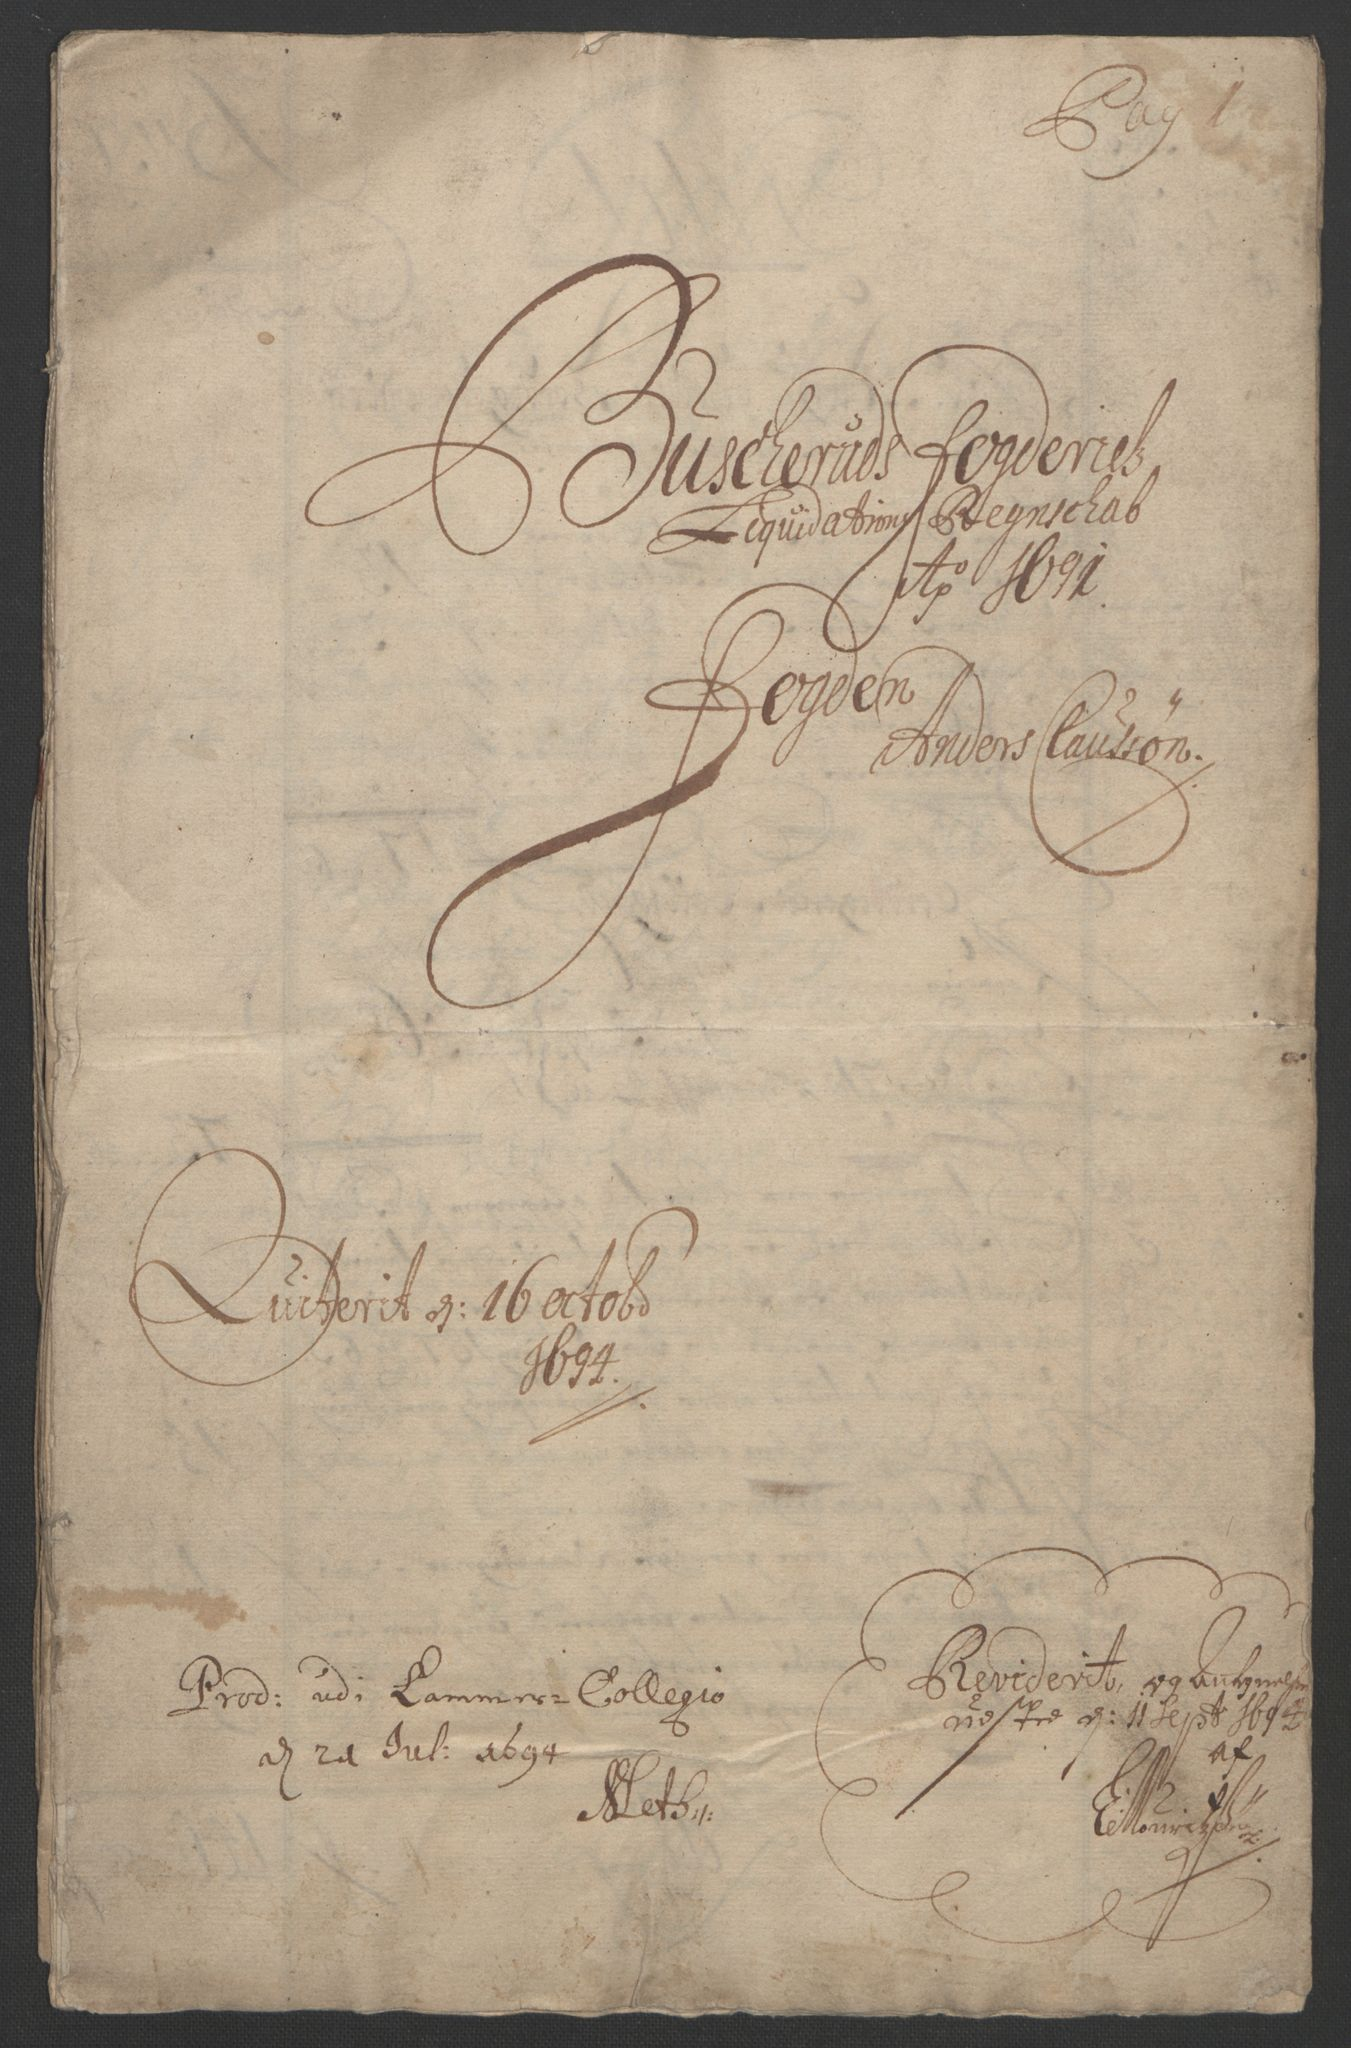 RA, Rentekammeret inntil 1814, Reviderte regnskaper, Fogderegnskap, R25/L1681: Fogderegnskap Buskerud, 1691-1692, s. 3